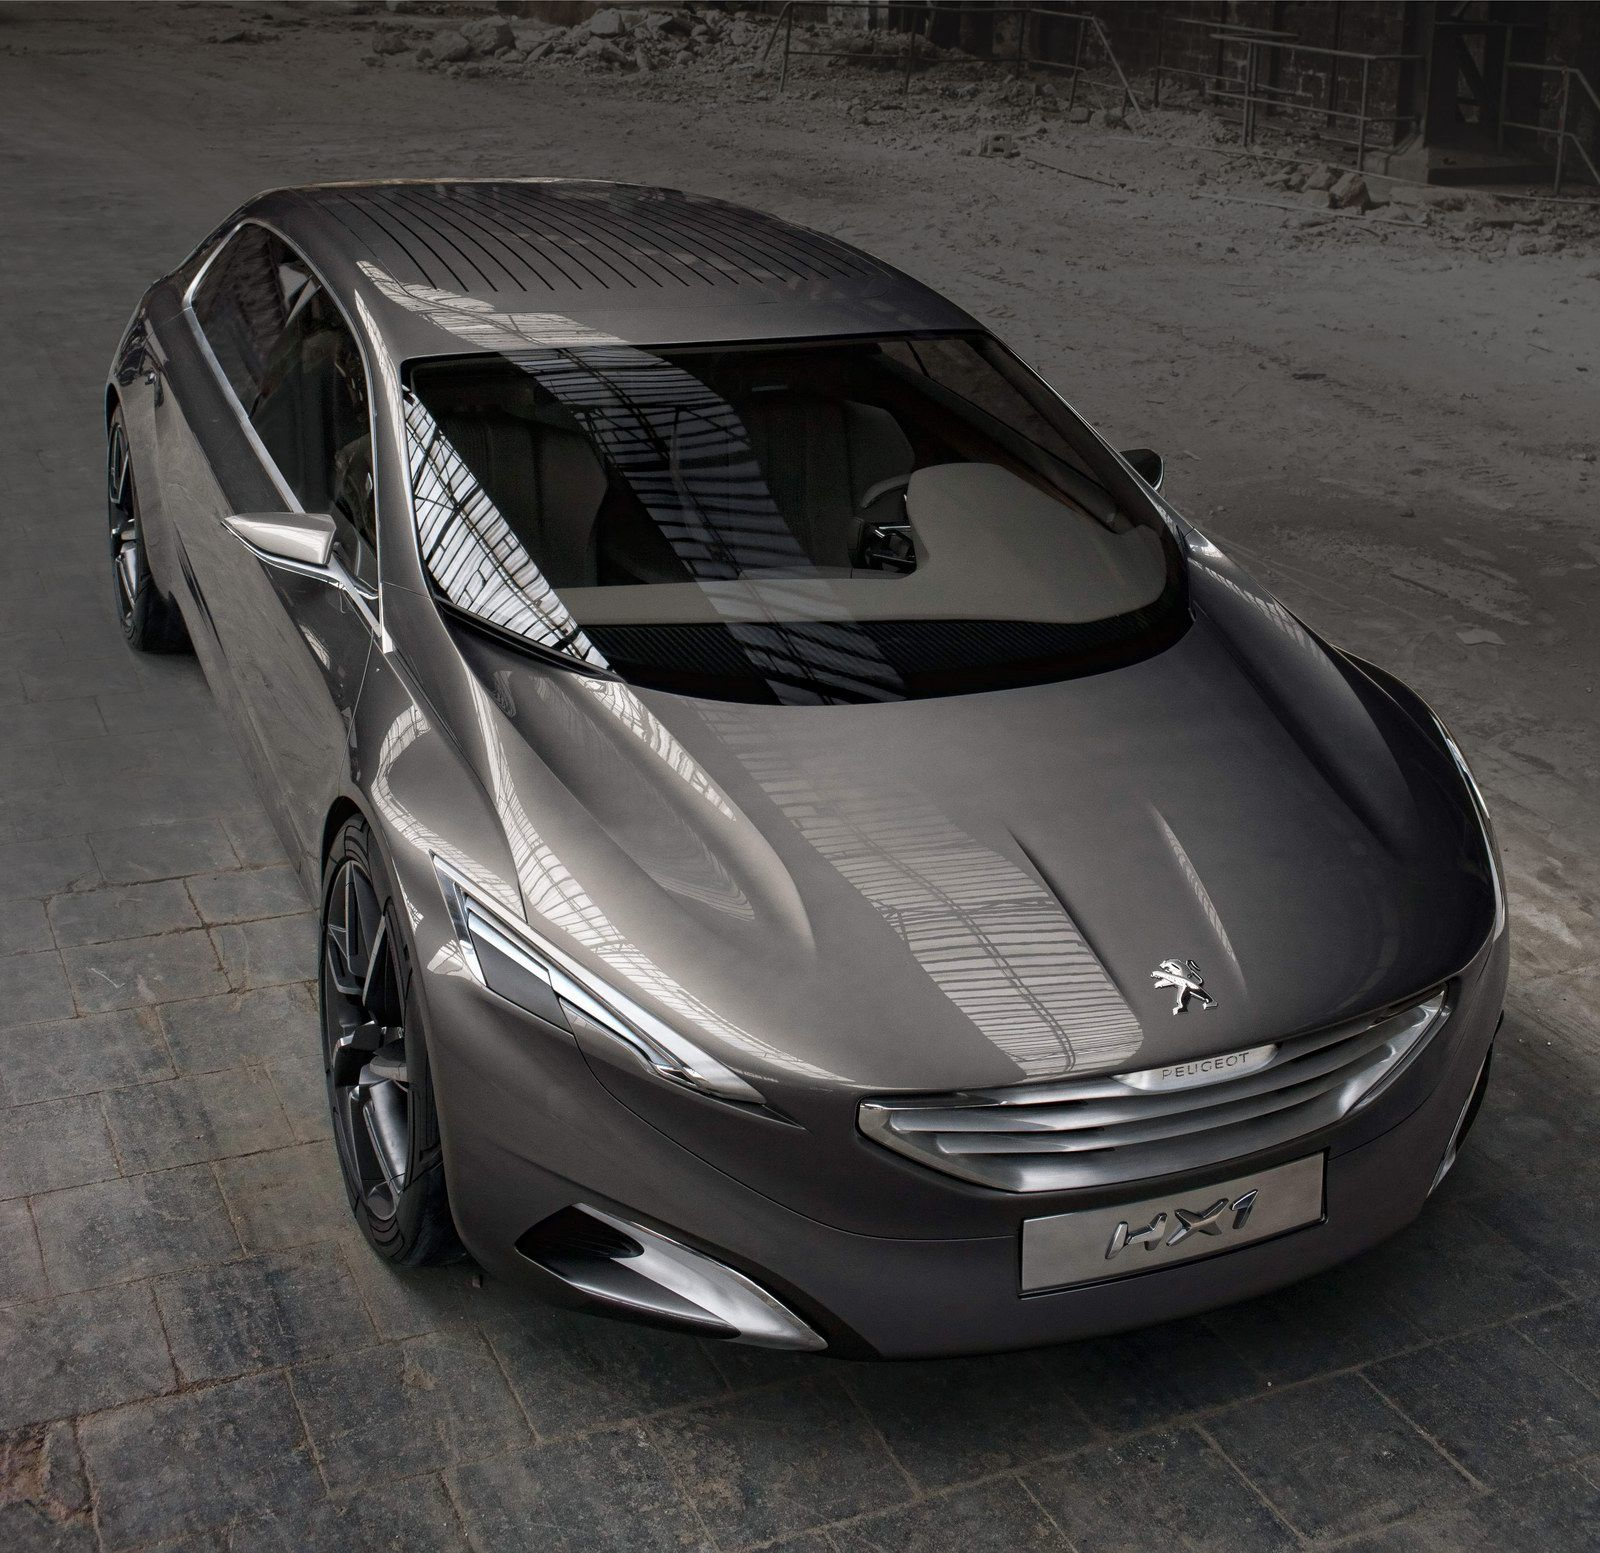 Frankfurt Show Preview: Peugeot's HX1 Hybrid4 MPV Concept